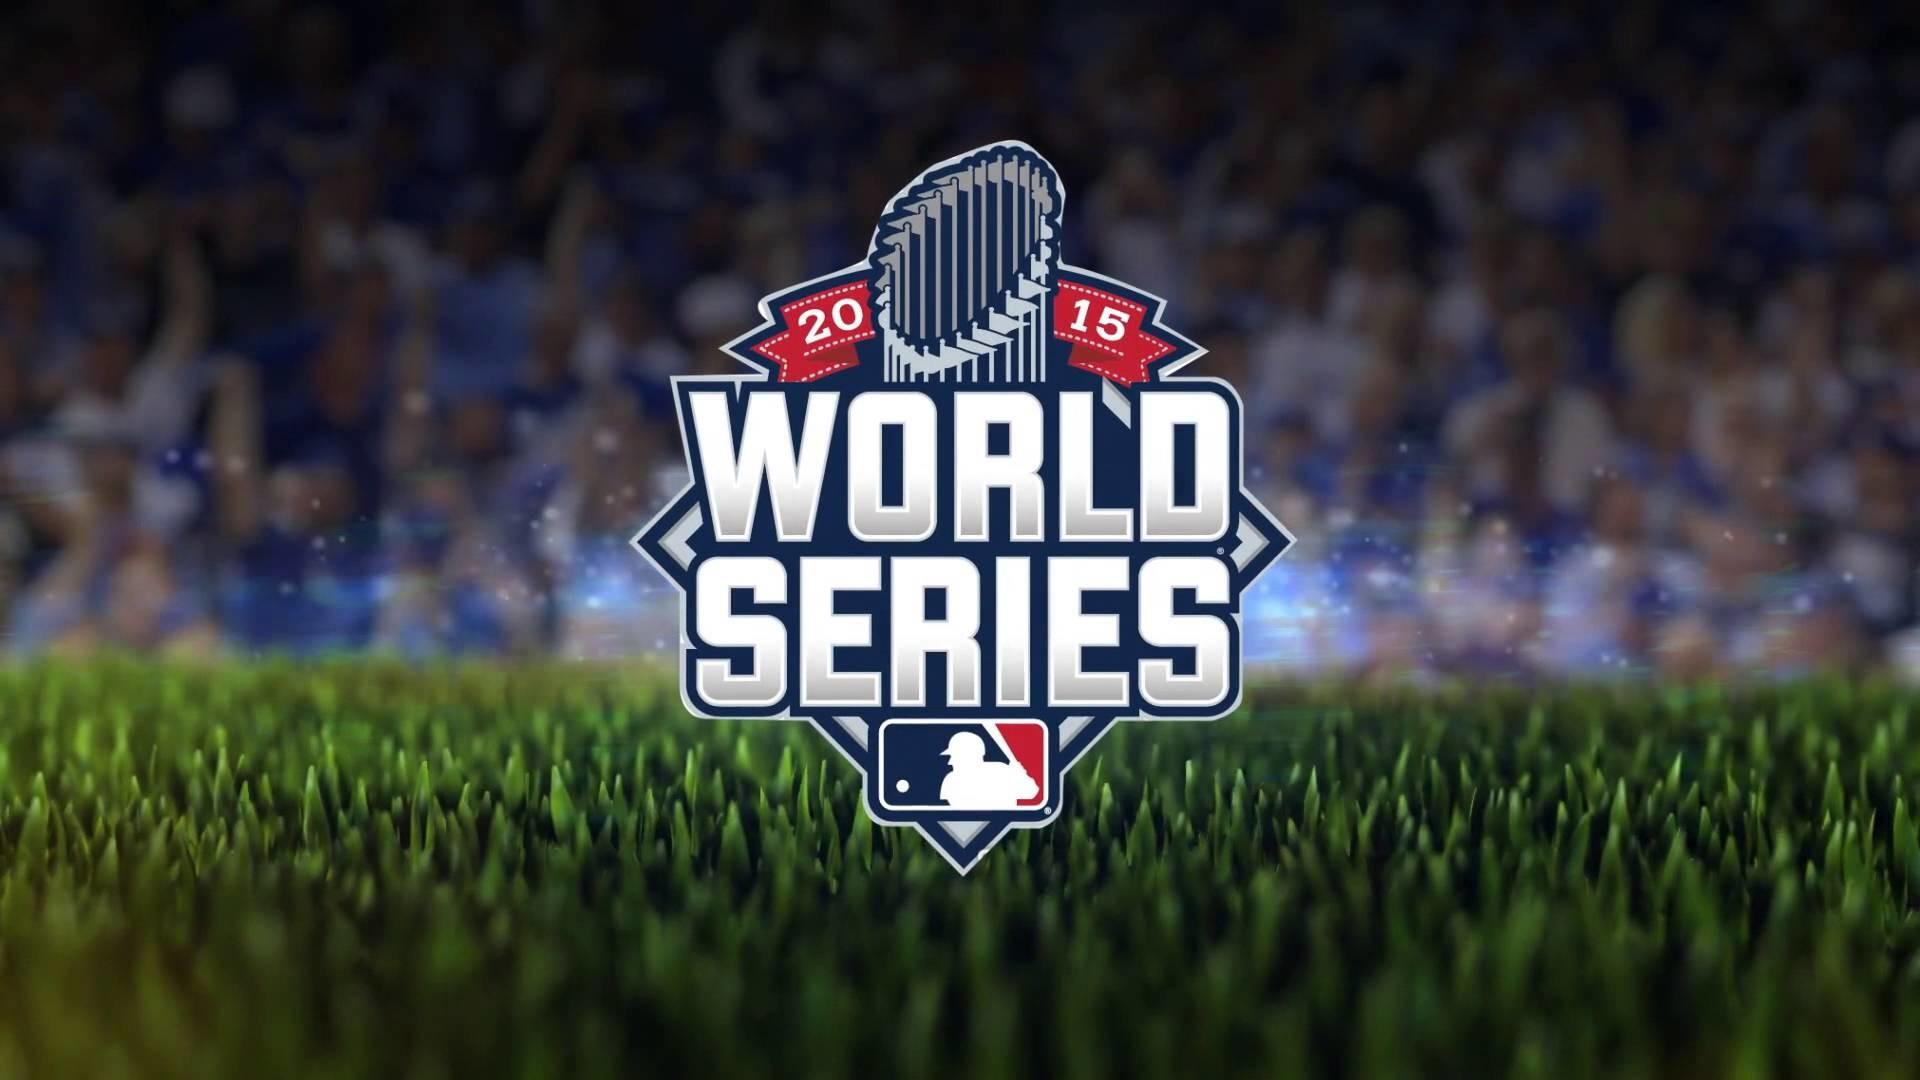 Kansas City Royals Advance to World Series 2015 HD